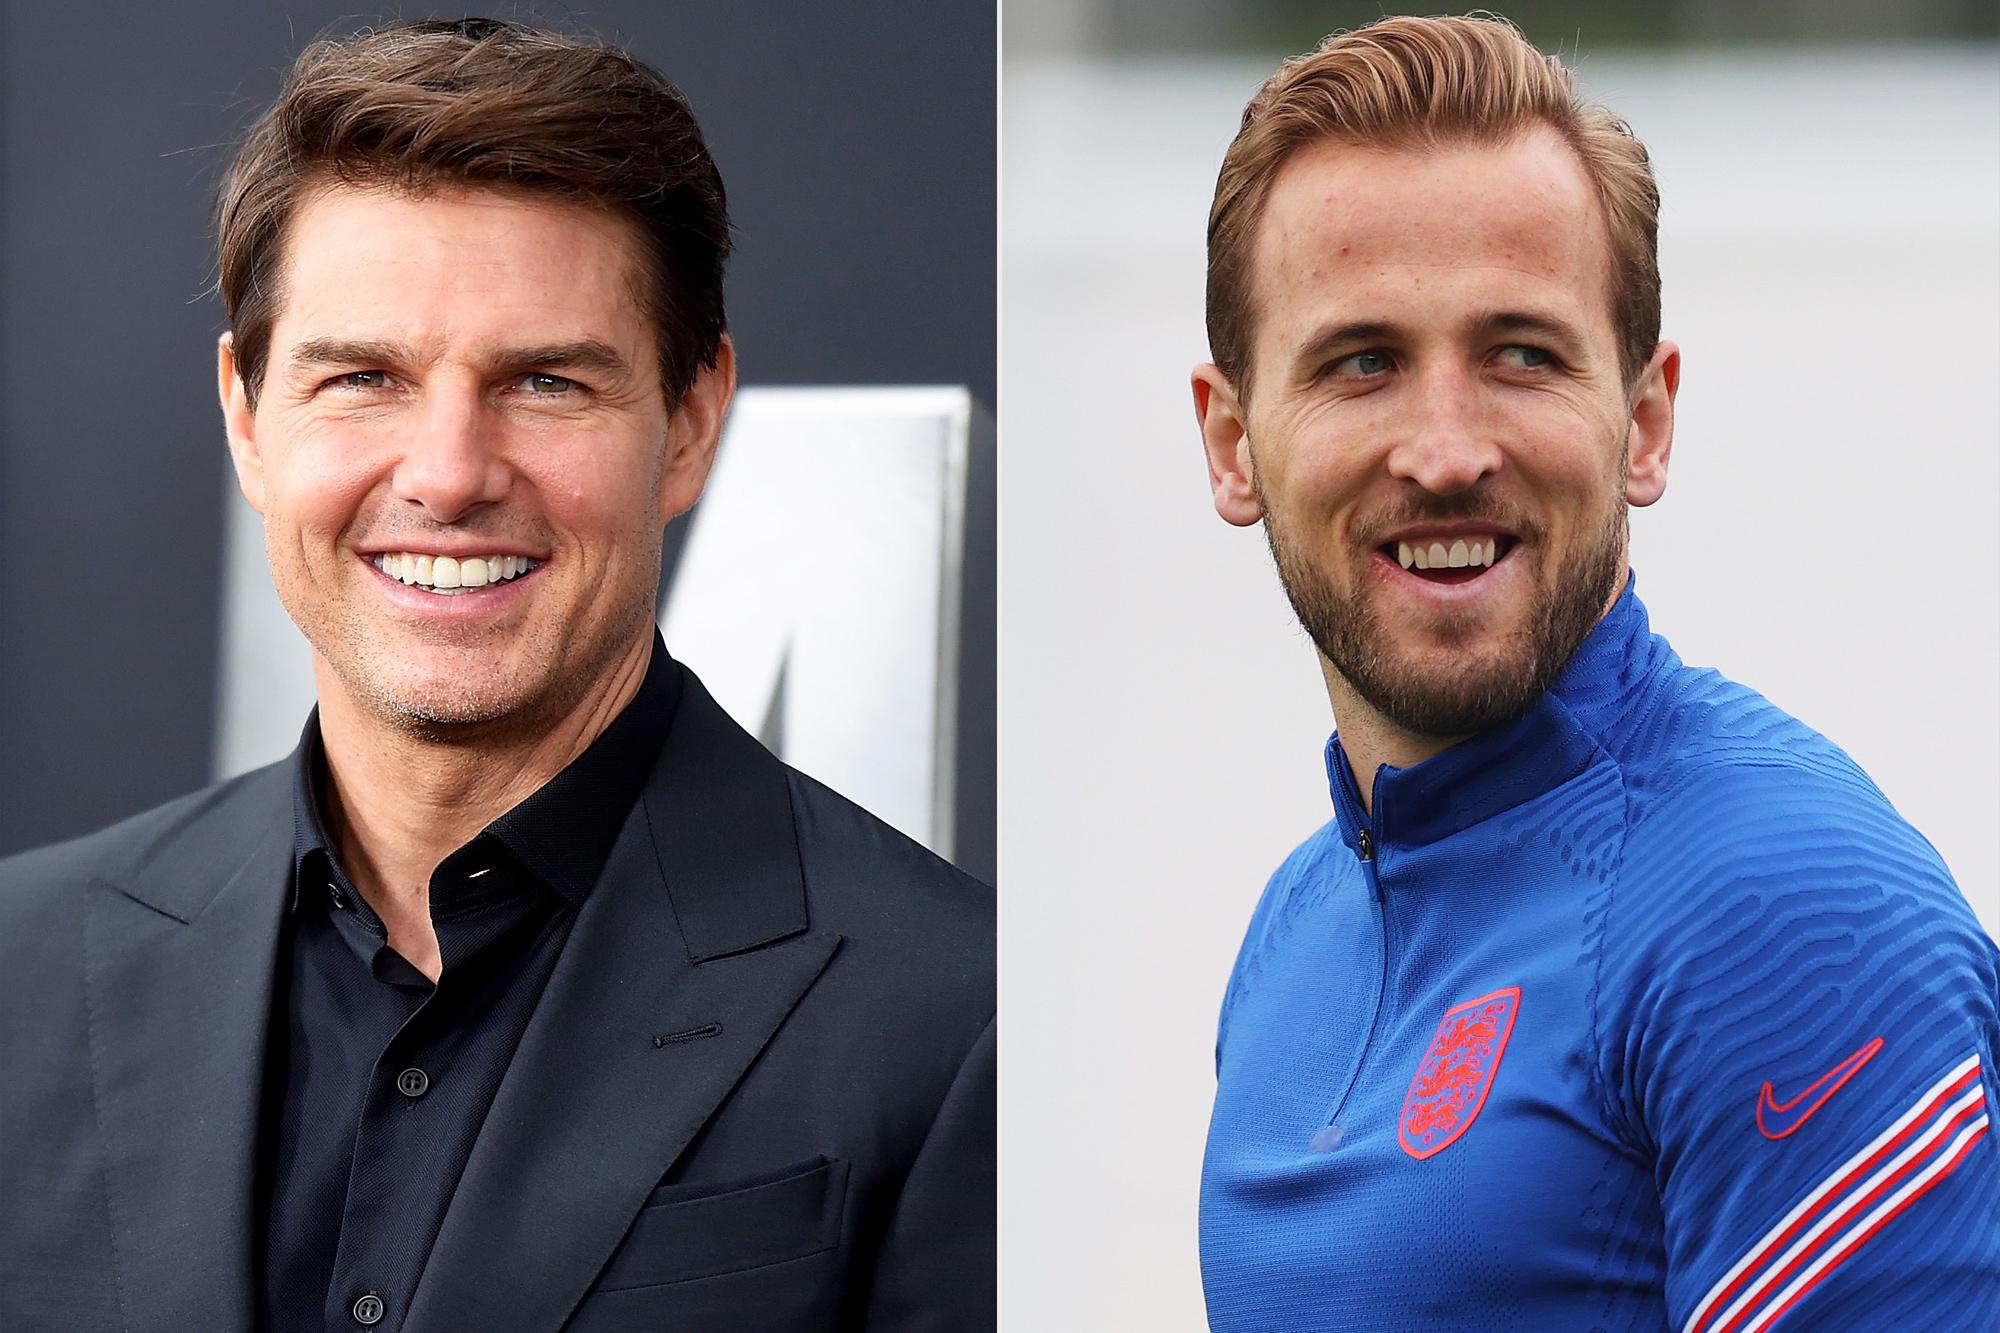 Tom Cruise and Harry Kane